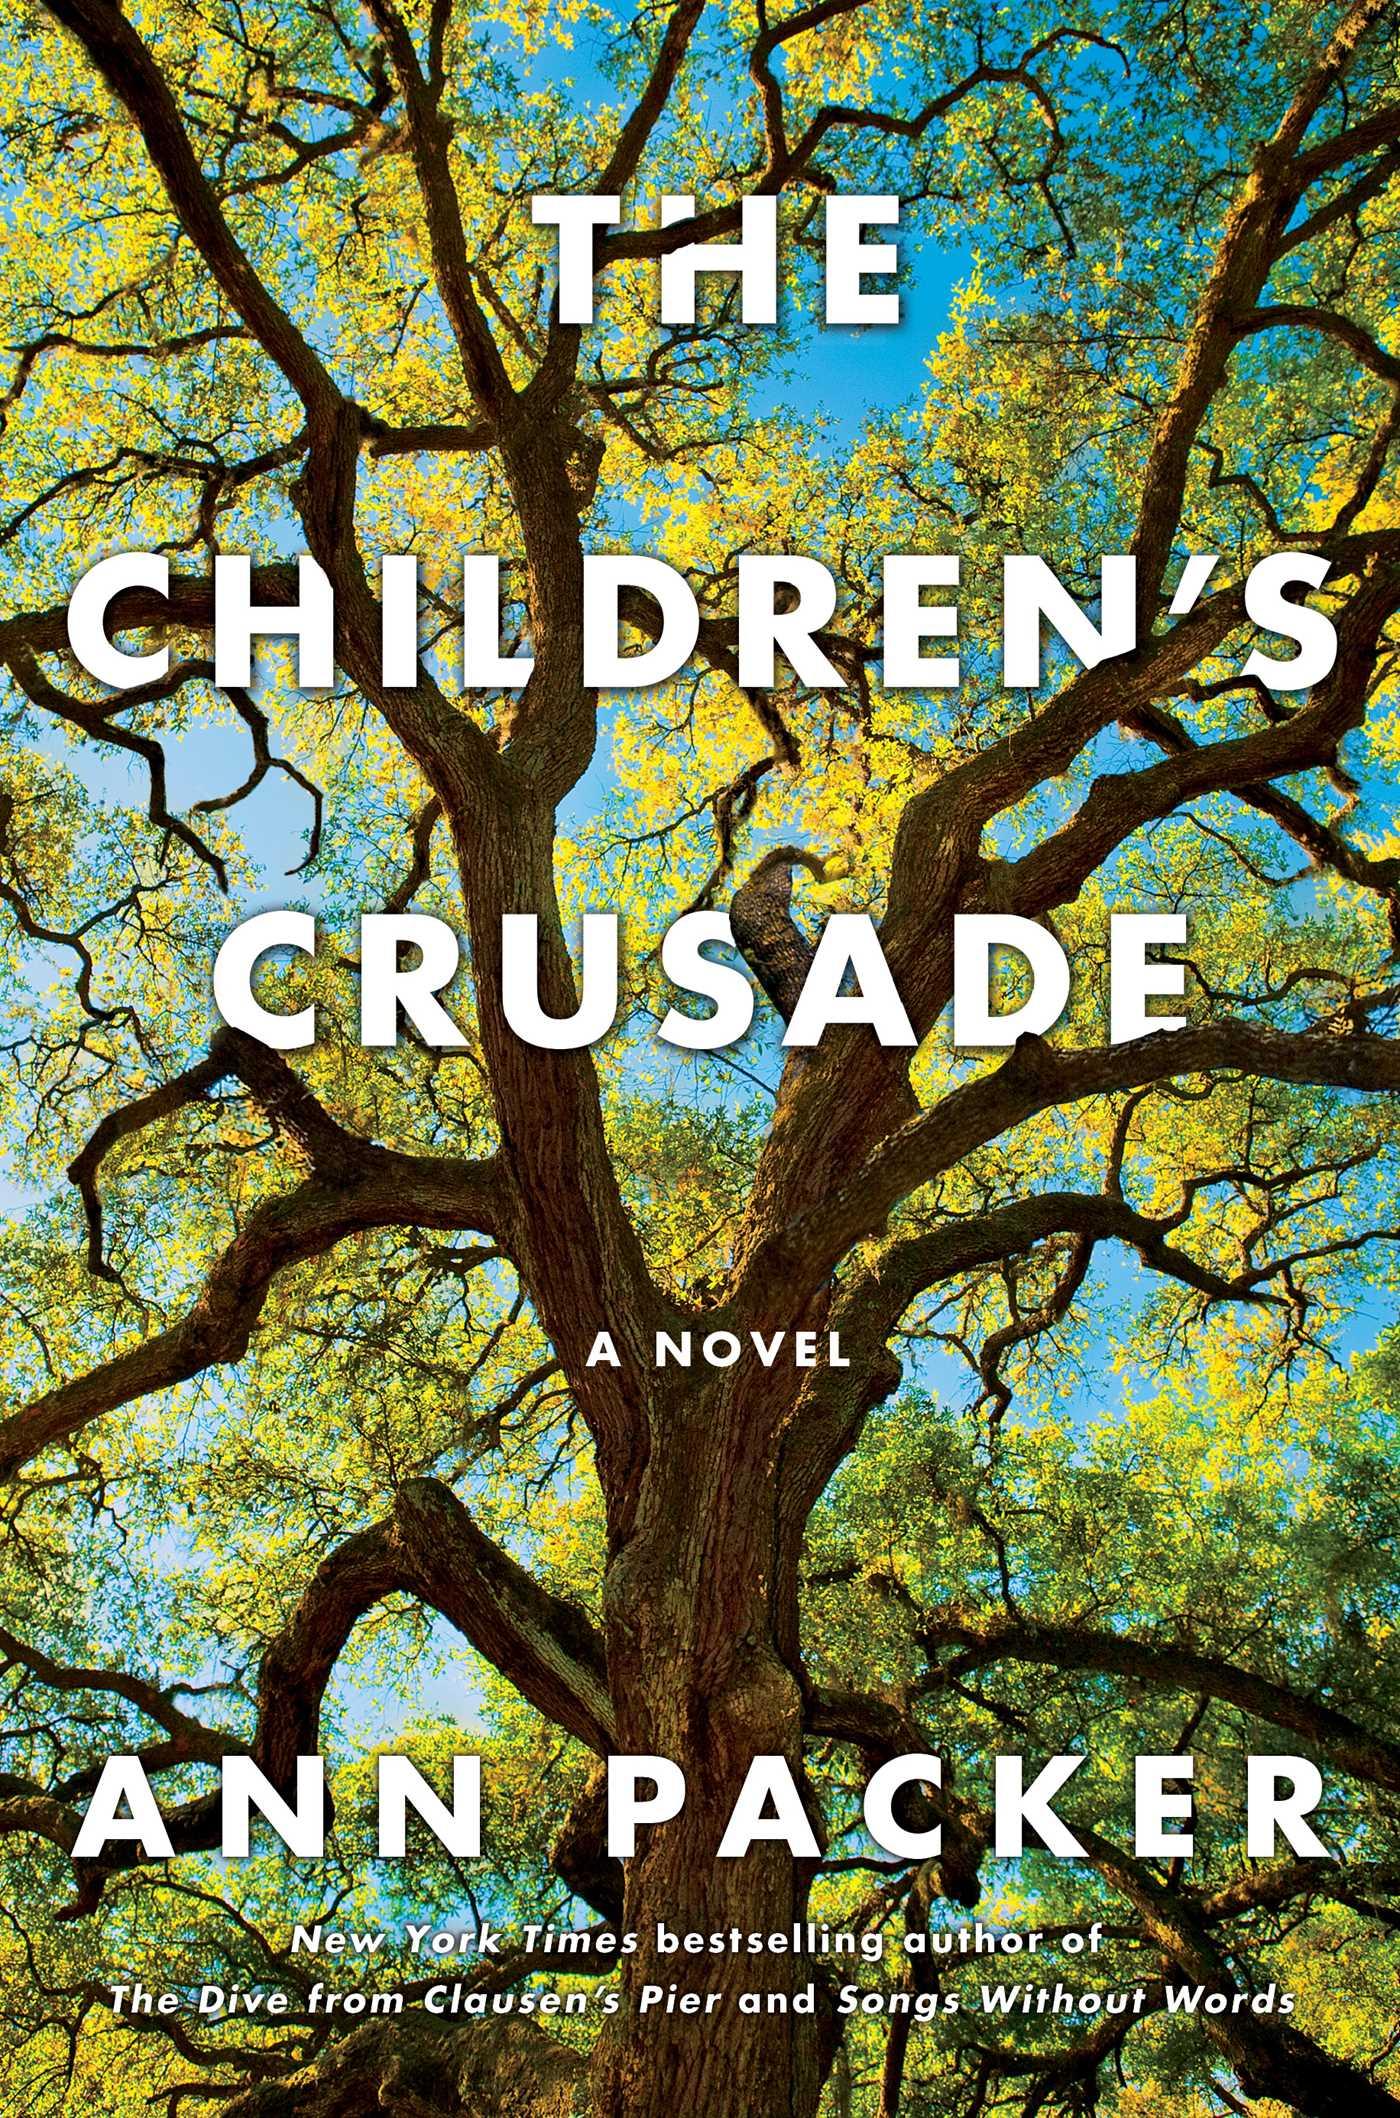 The childrens crusade 9781476710457 hr